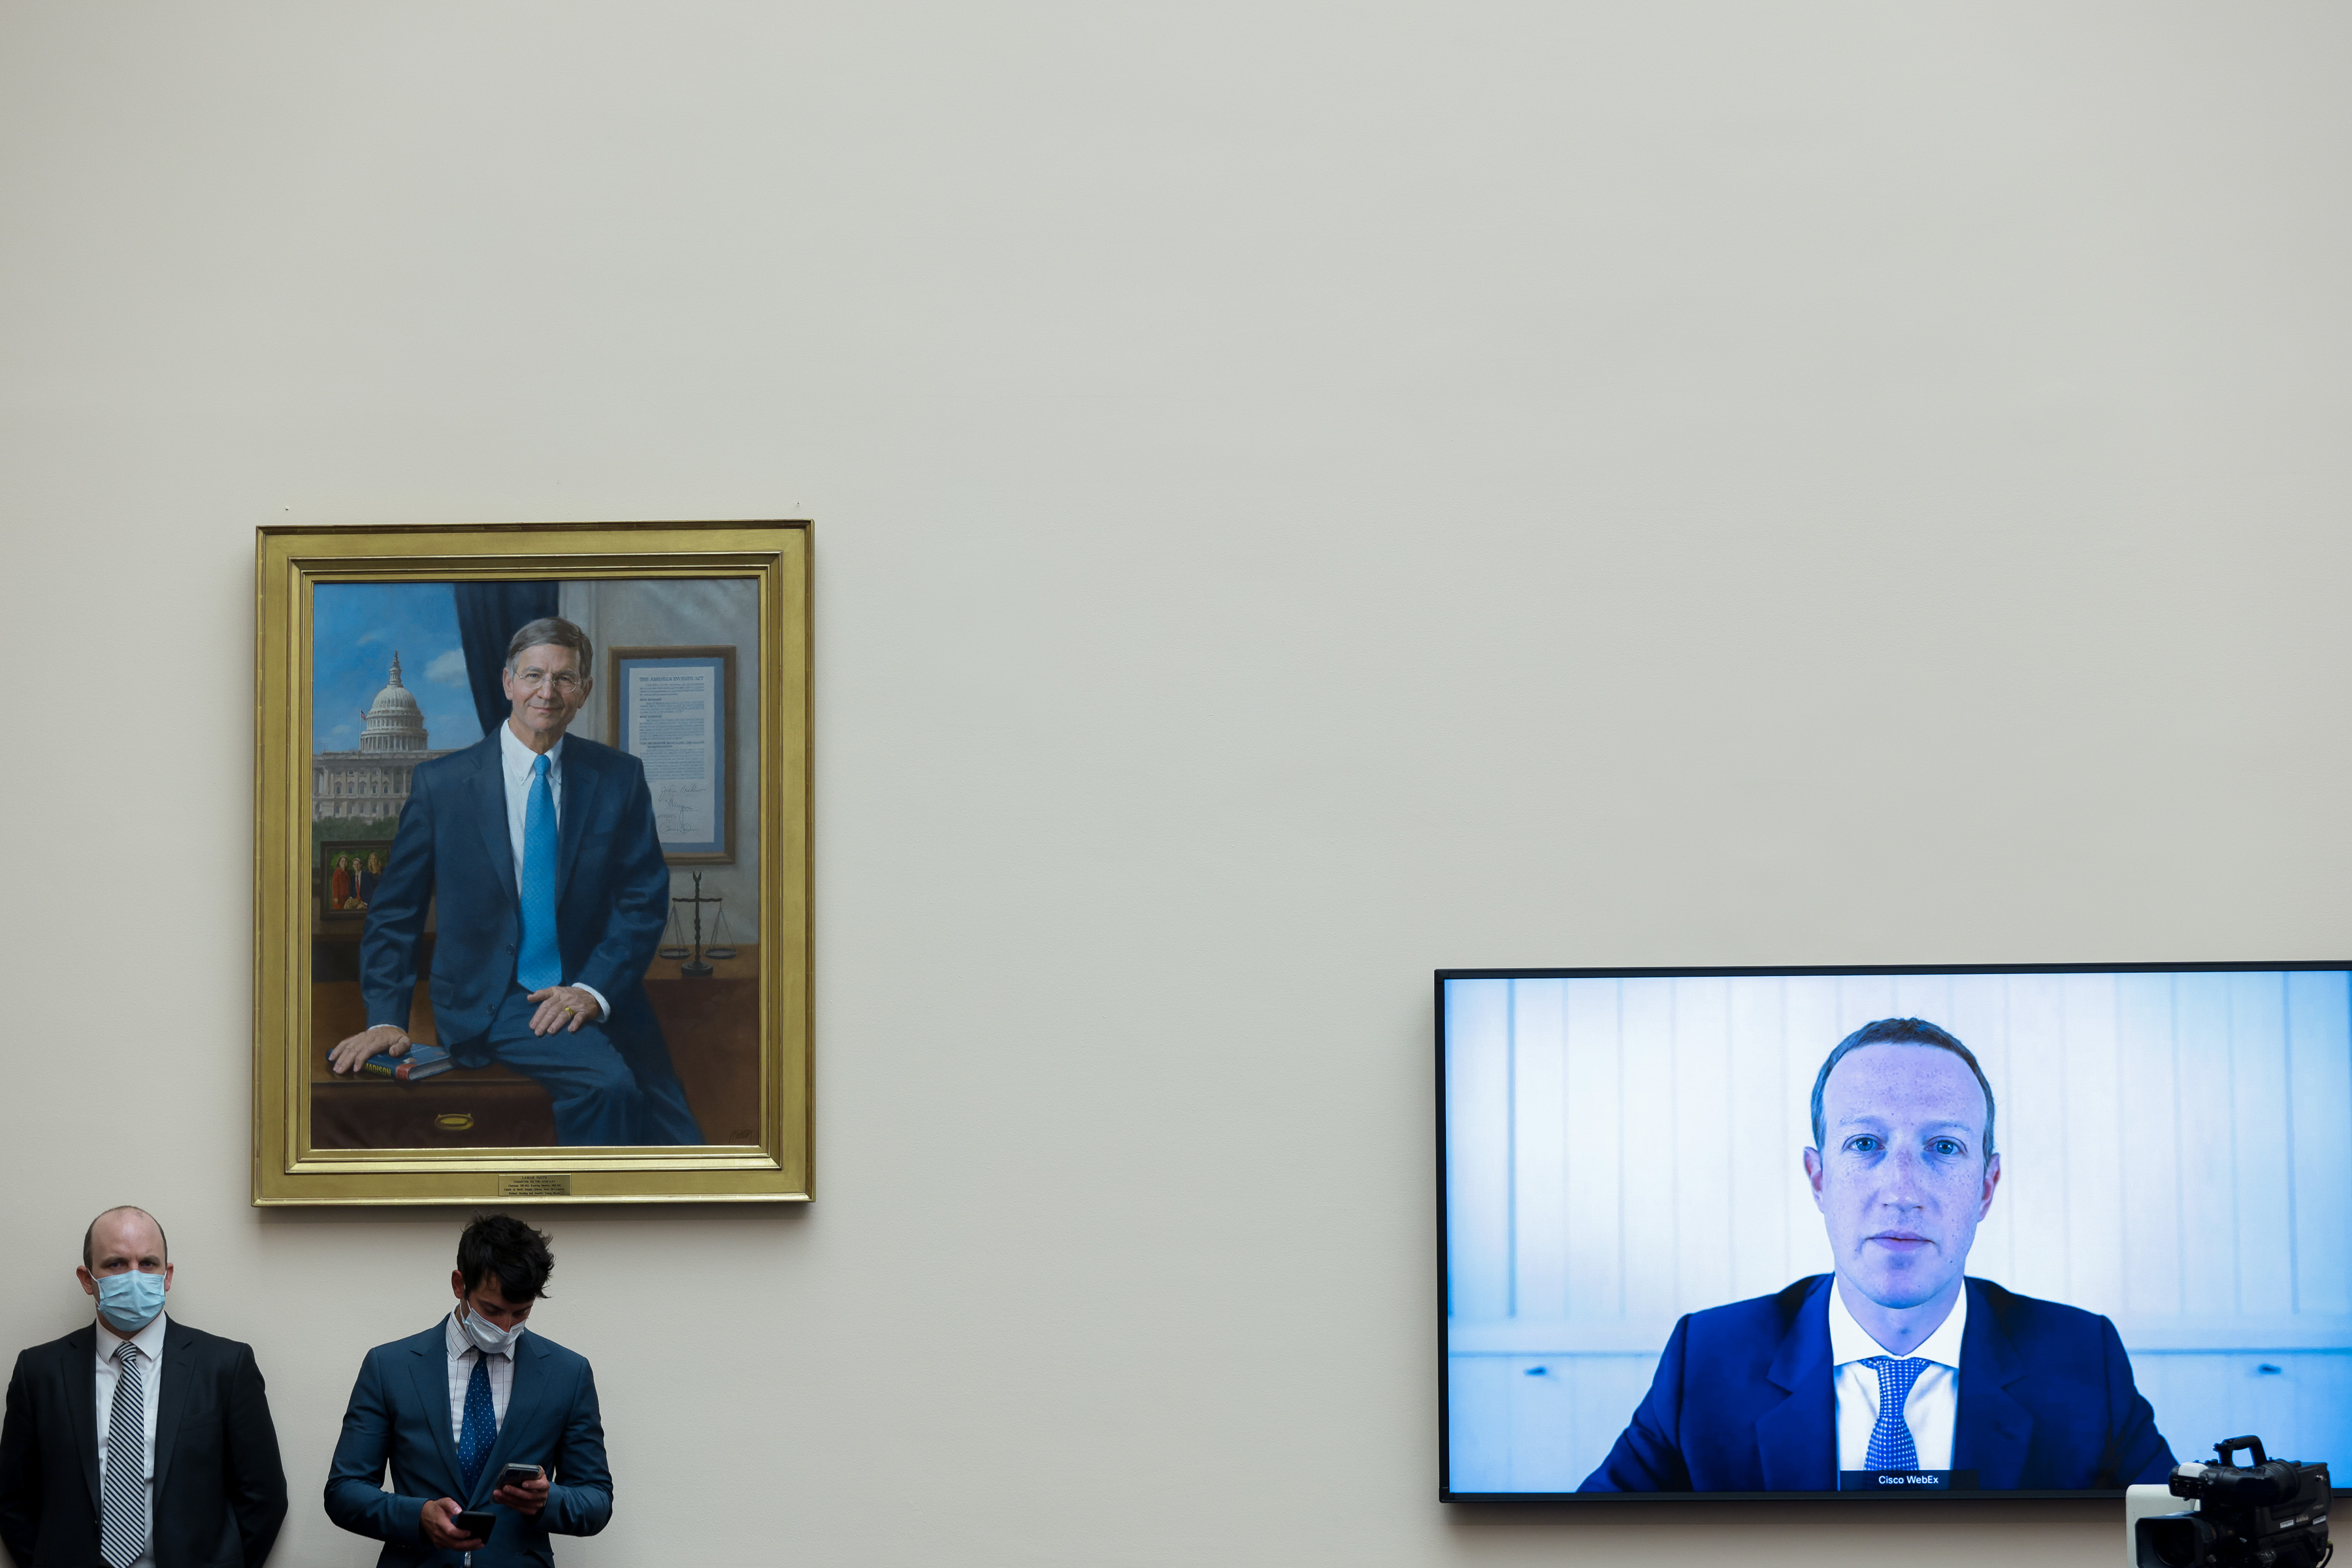 Mark Zuckerberg on a television screen speaking before Congress